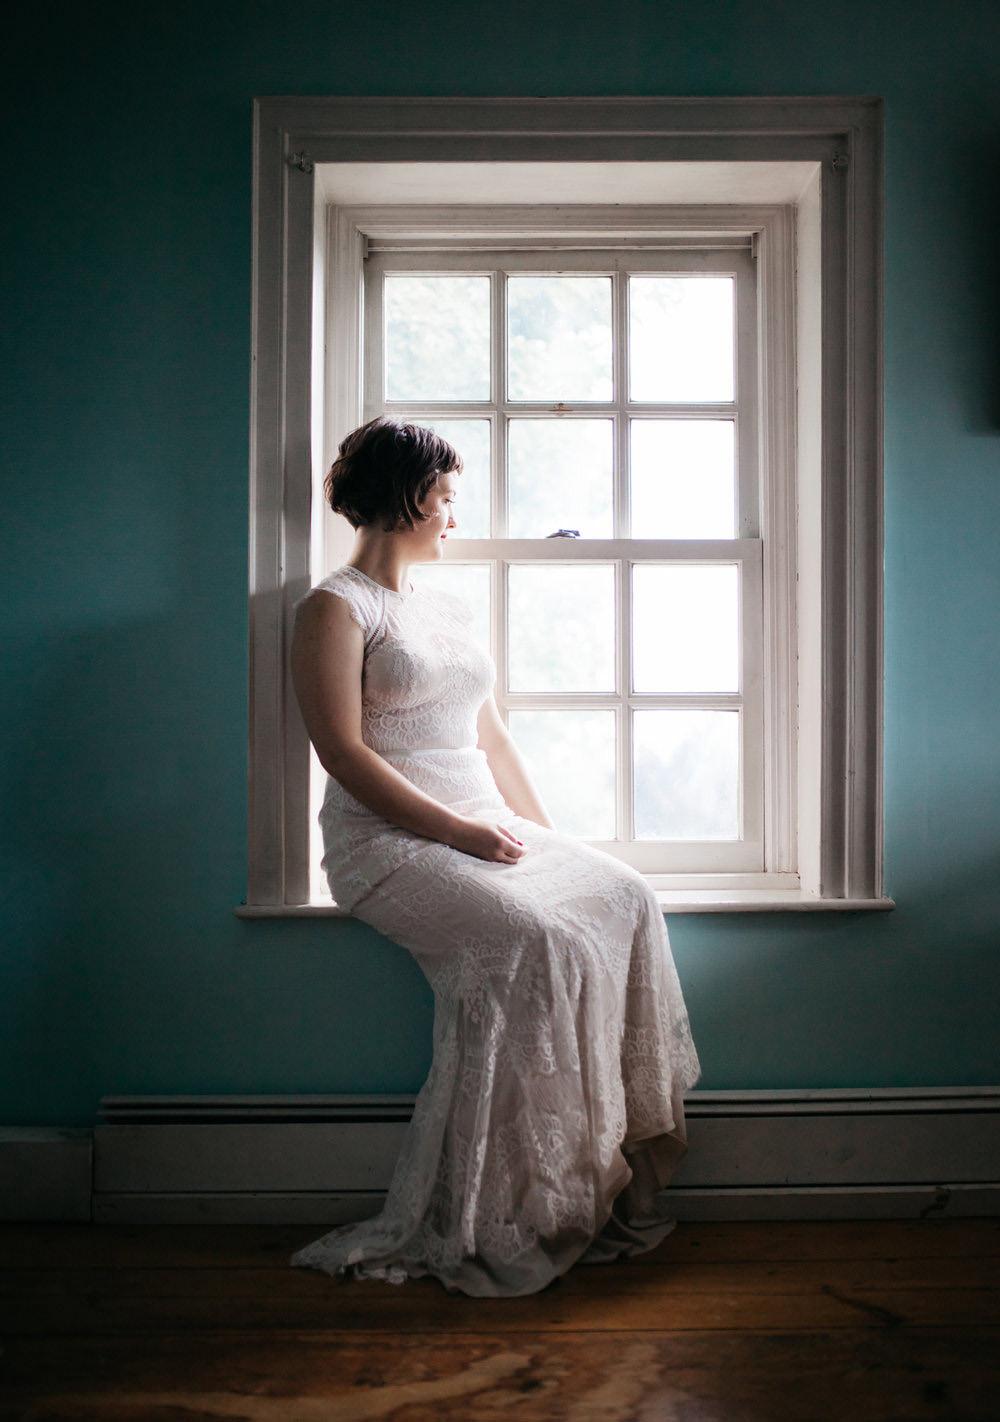 Chelsea & Aaron's Wedding at Windrift Hall. Shot by Hudson Valley Photographer Jenn Morse Photography.